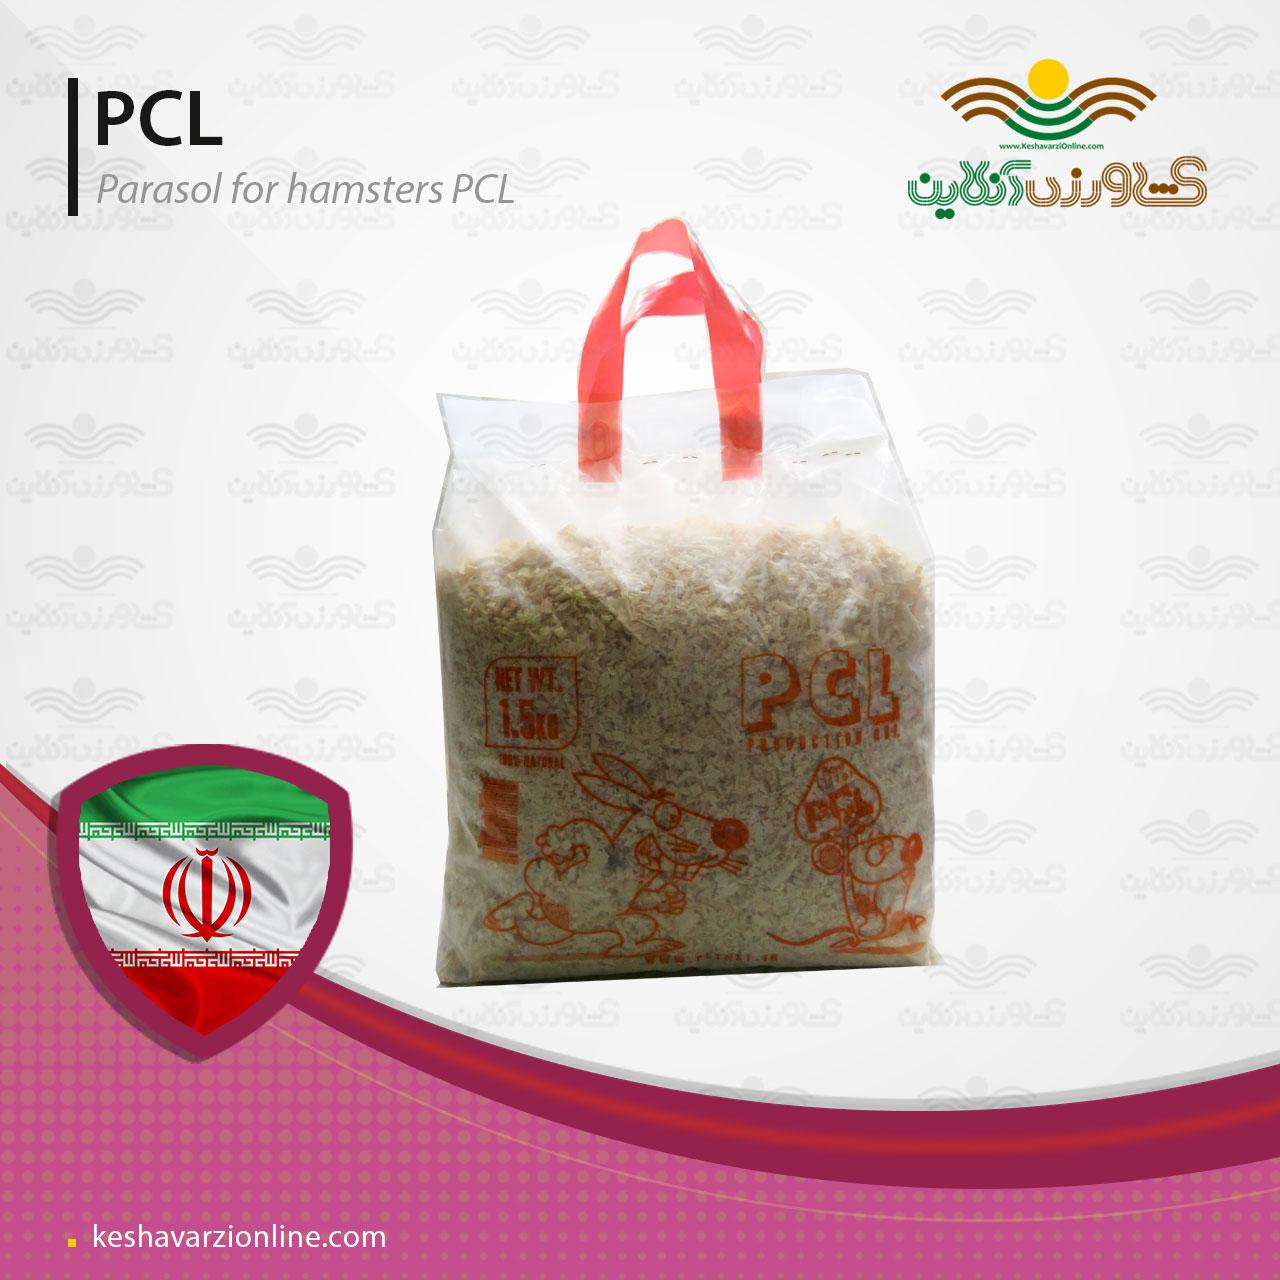 پوشال مخصوص همستر PCL